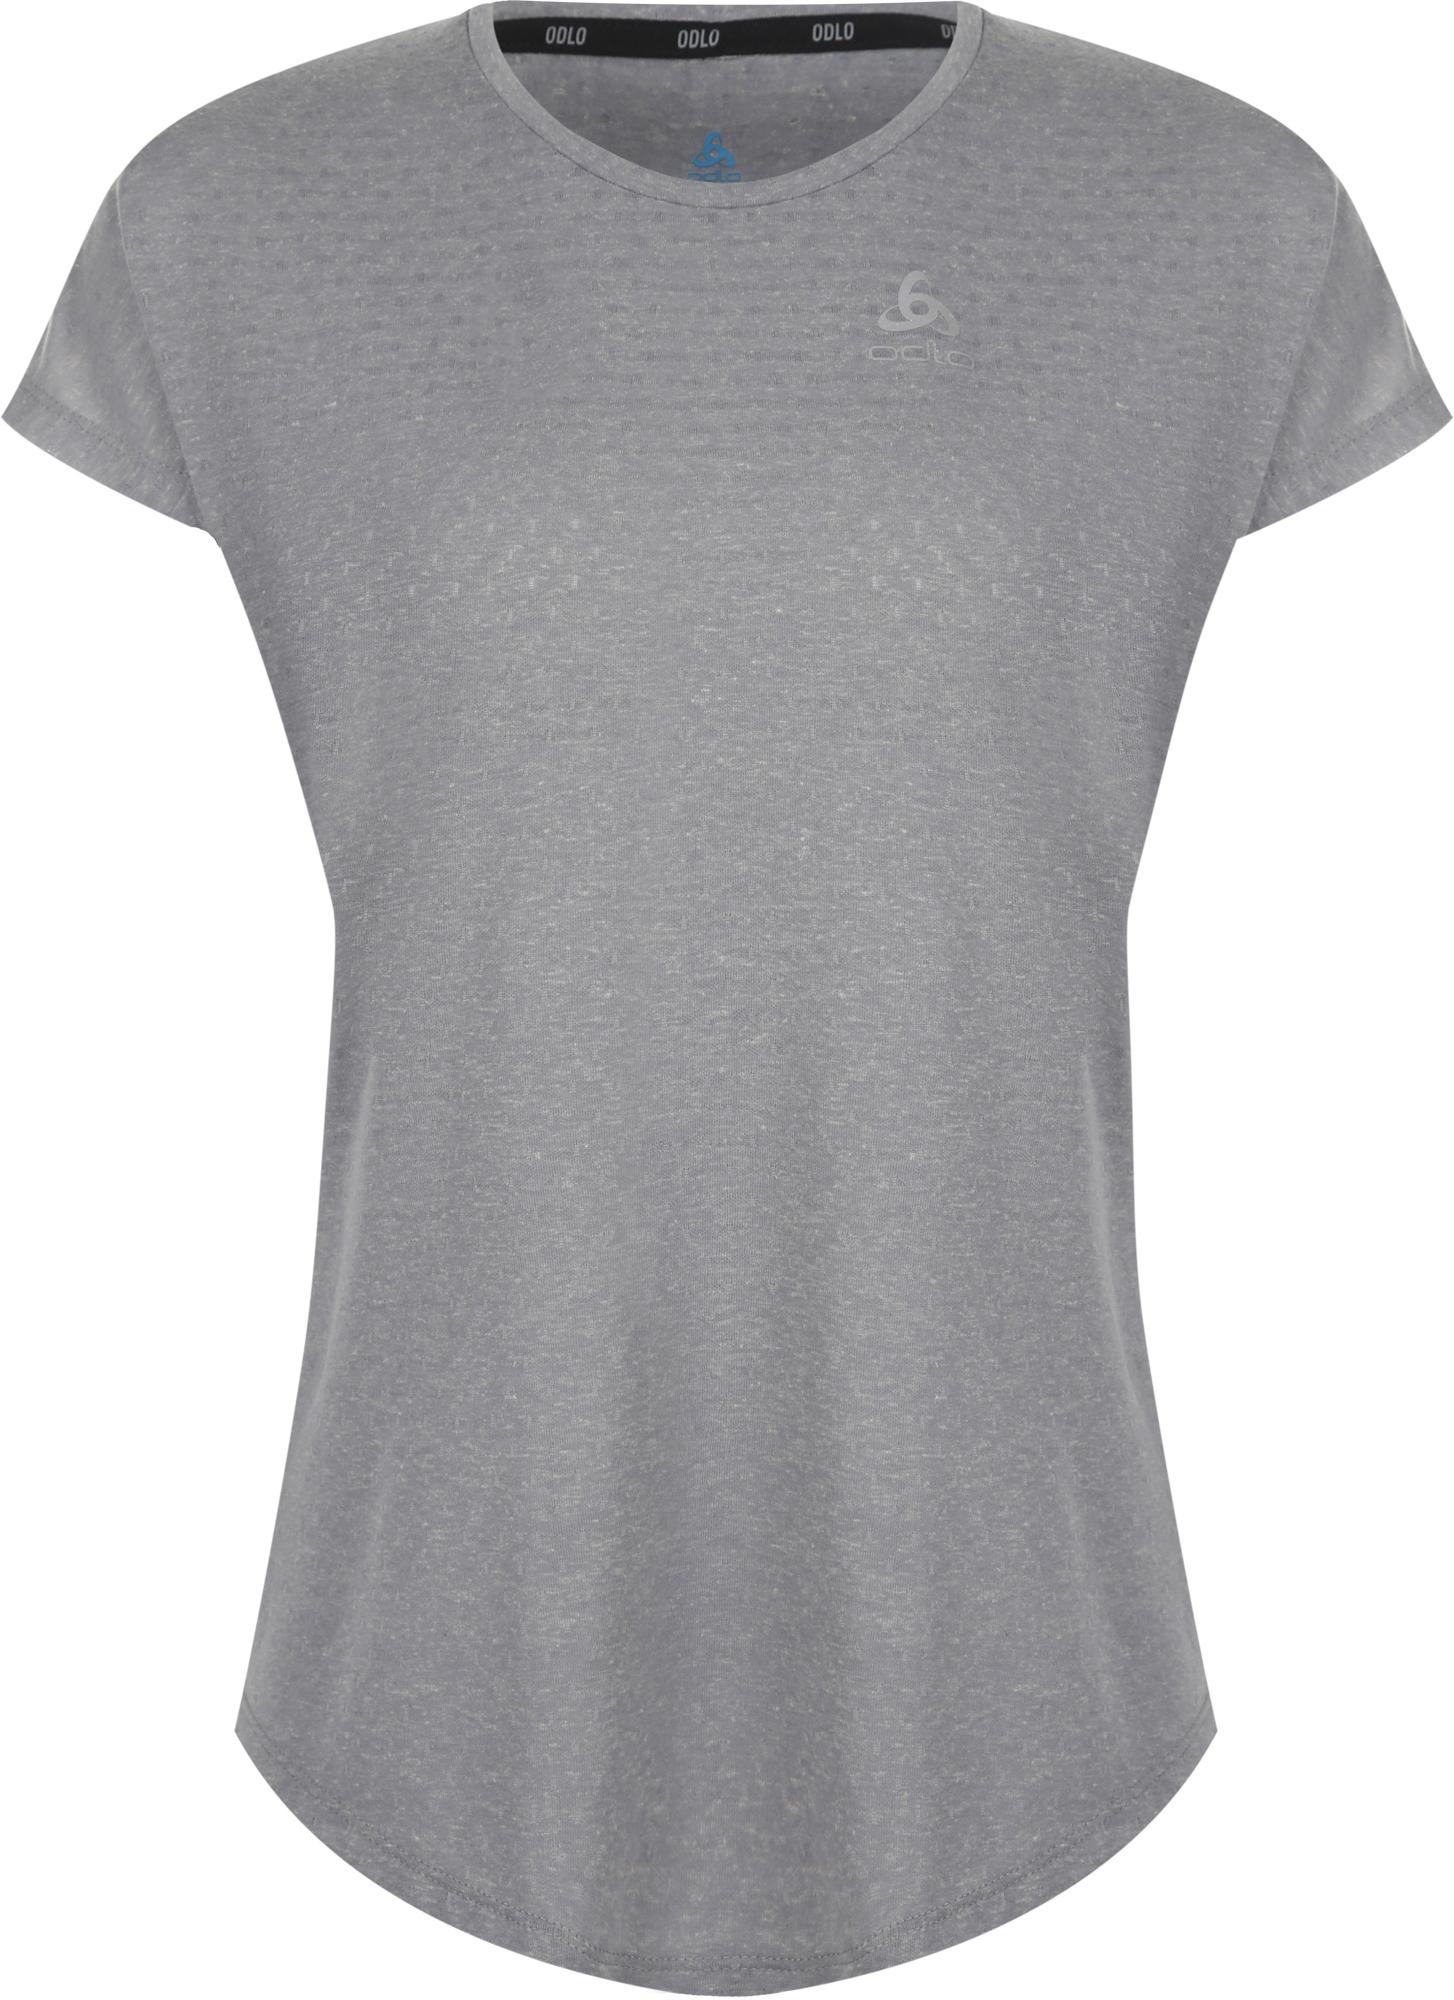 Odlo Футболка женская Odlo Millennium, размер 46-48 odlo футболка женская odlo millennium размер 46 48